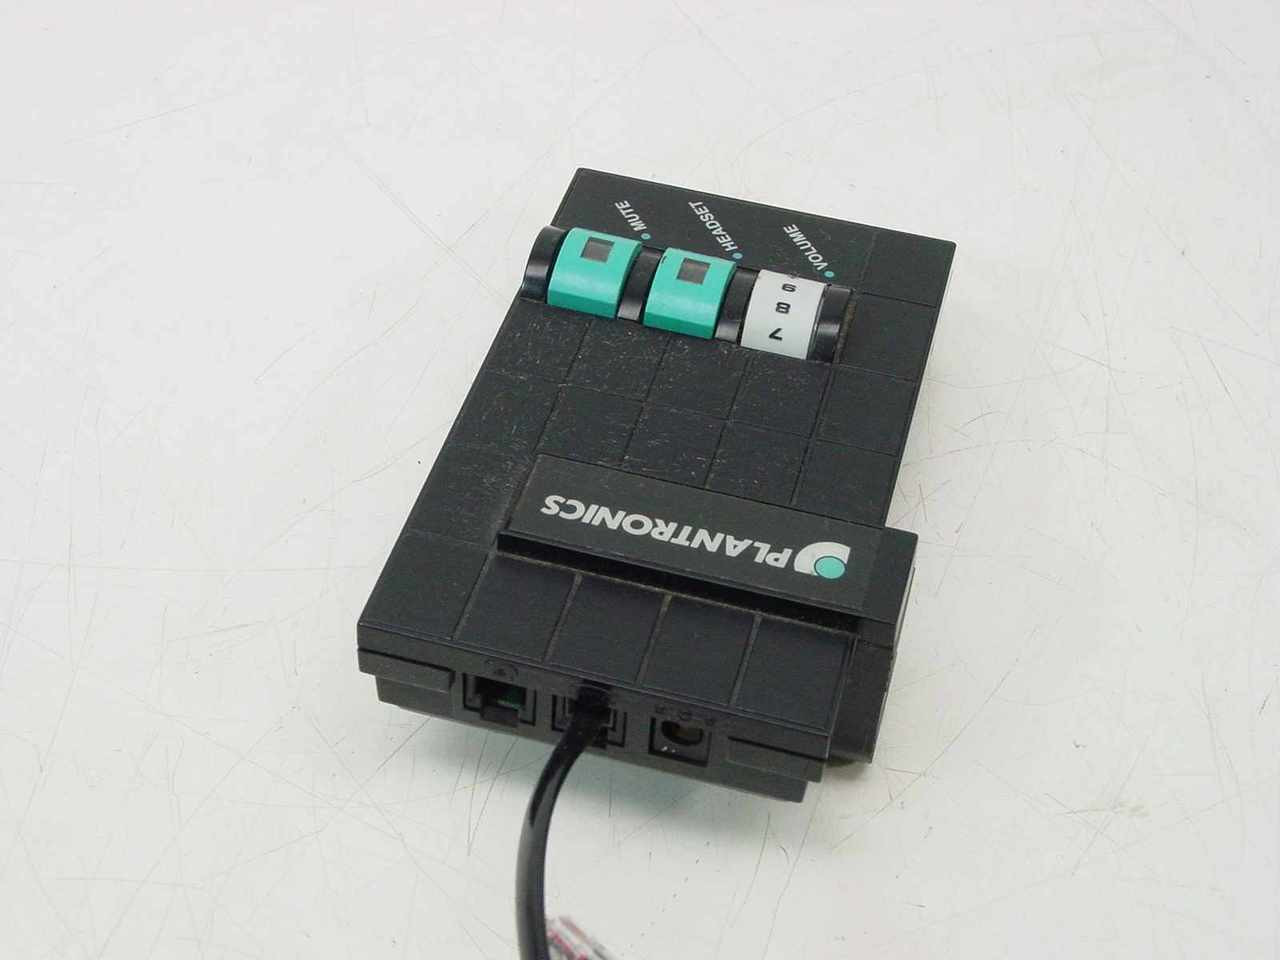 plantronics headset telephone to headset adapter m10  [ 1280 x 960 Pixel ]